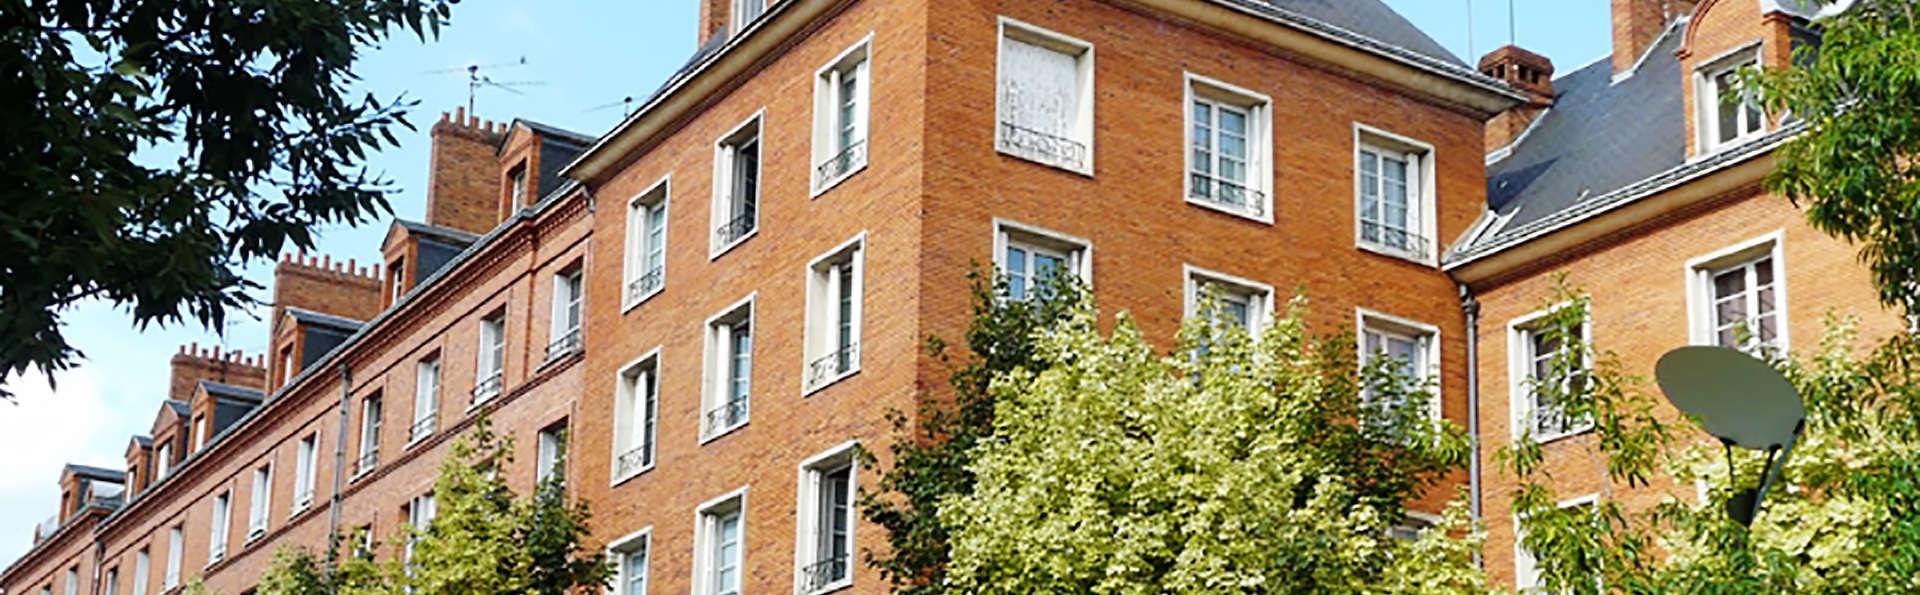 Hotel Marguerite - EDIT_Fachada_3.jpg